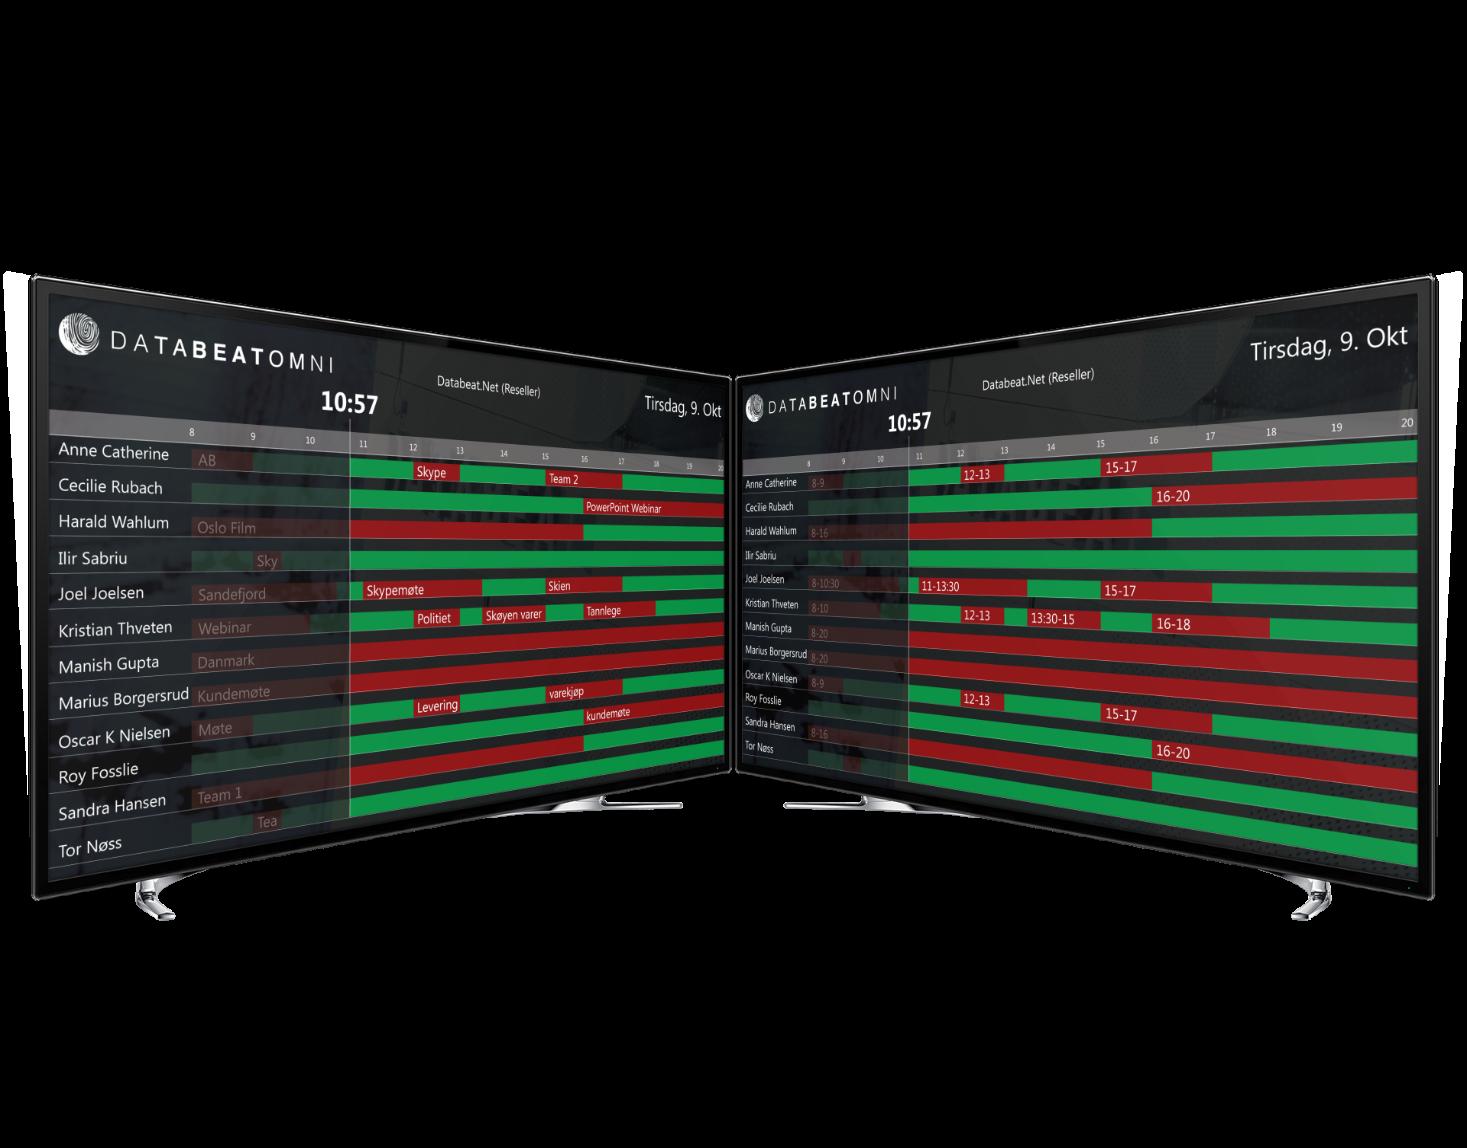 DatabeatOMNI Overview